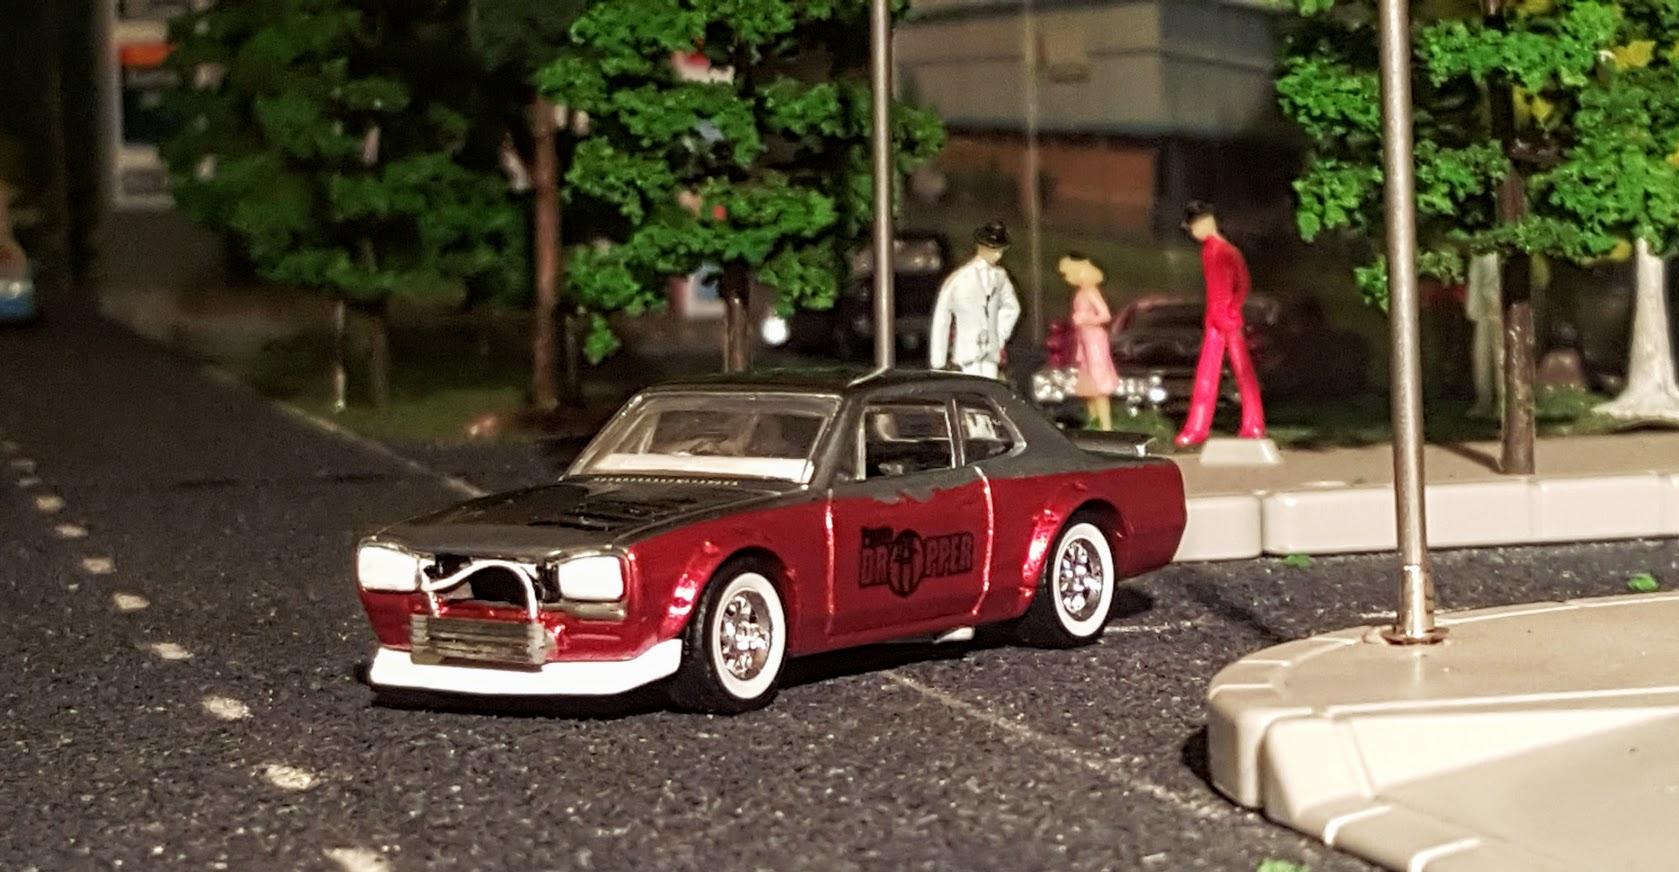 How To Make A 1 64 Scale Diorama Hotwheels Diecast Cars